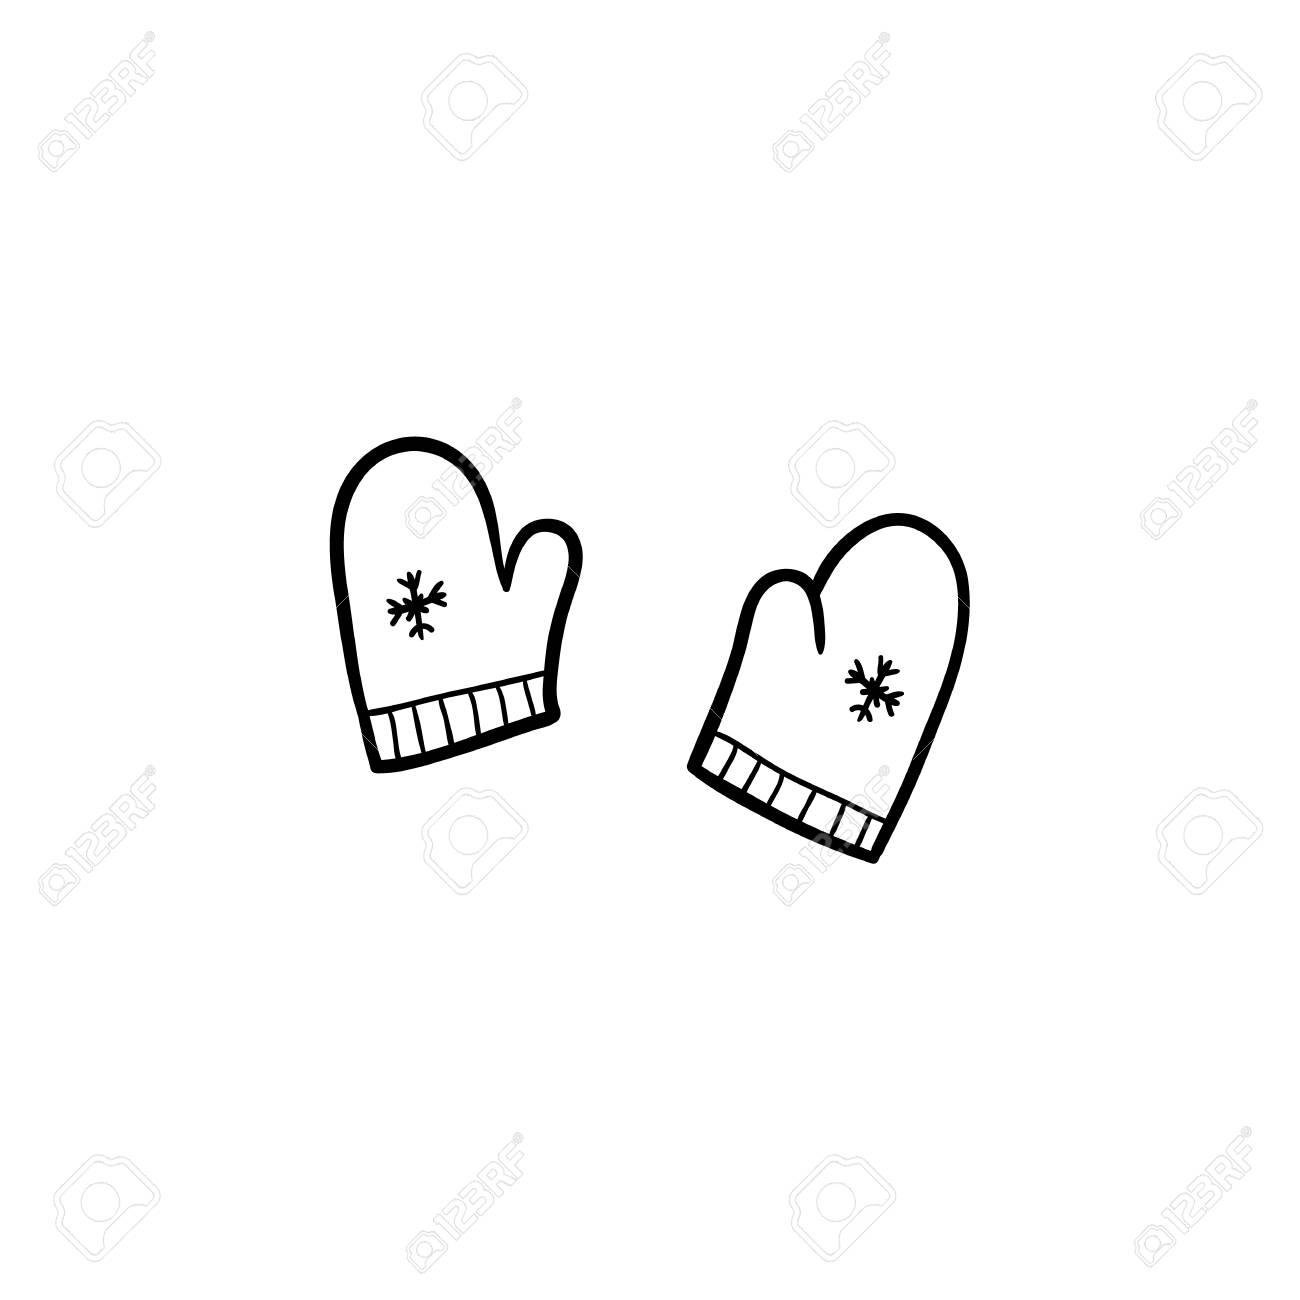 Vector De Dibujos Animados Plana Bebe Monocromo De Punto Guantes